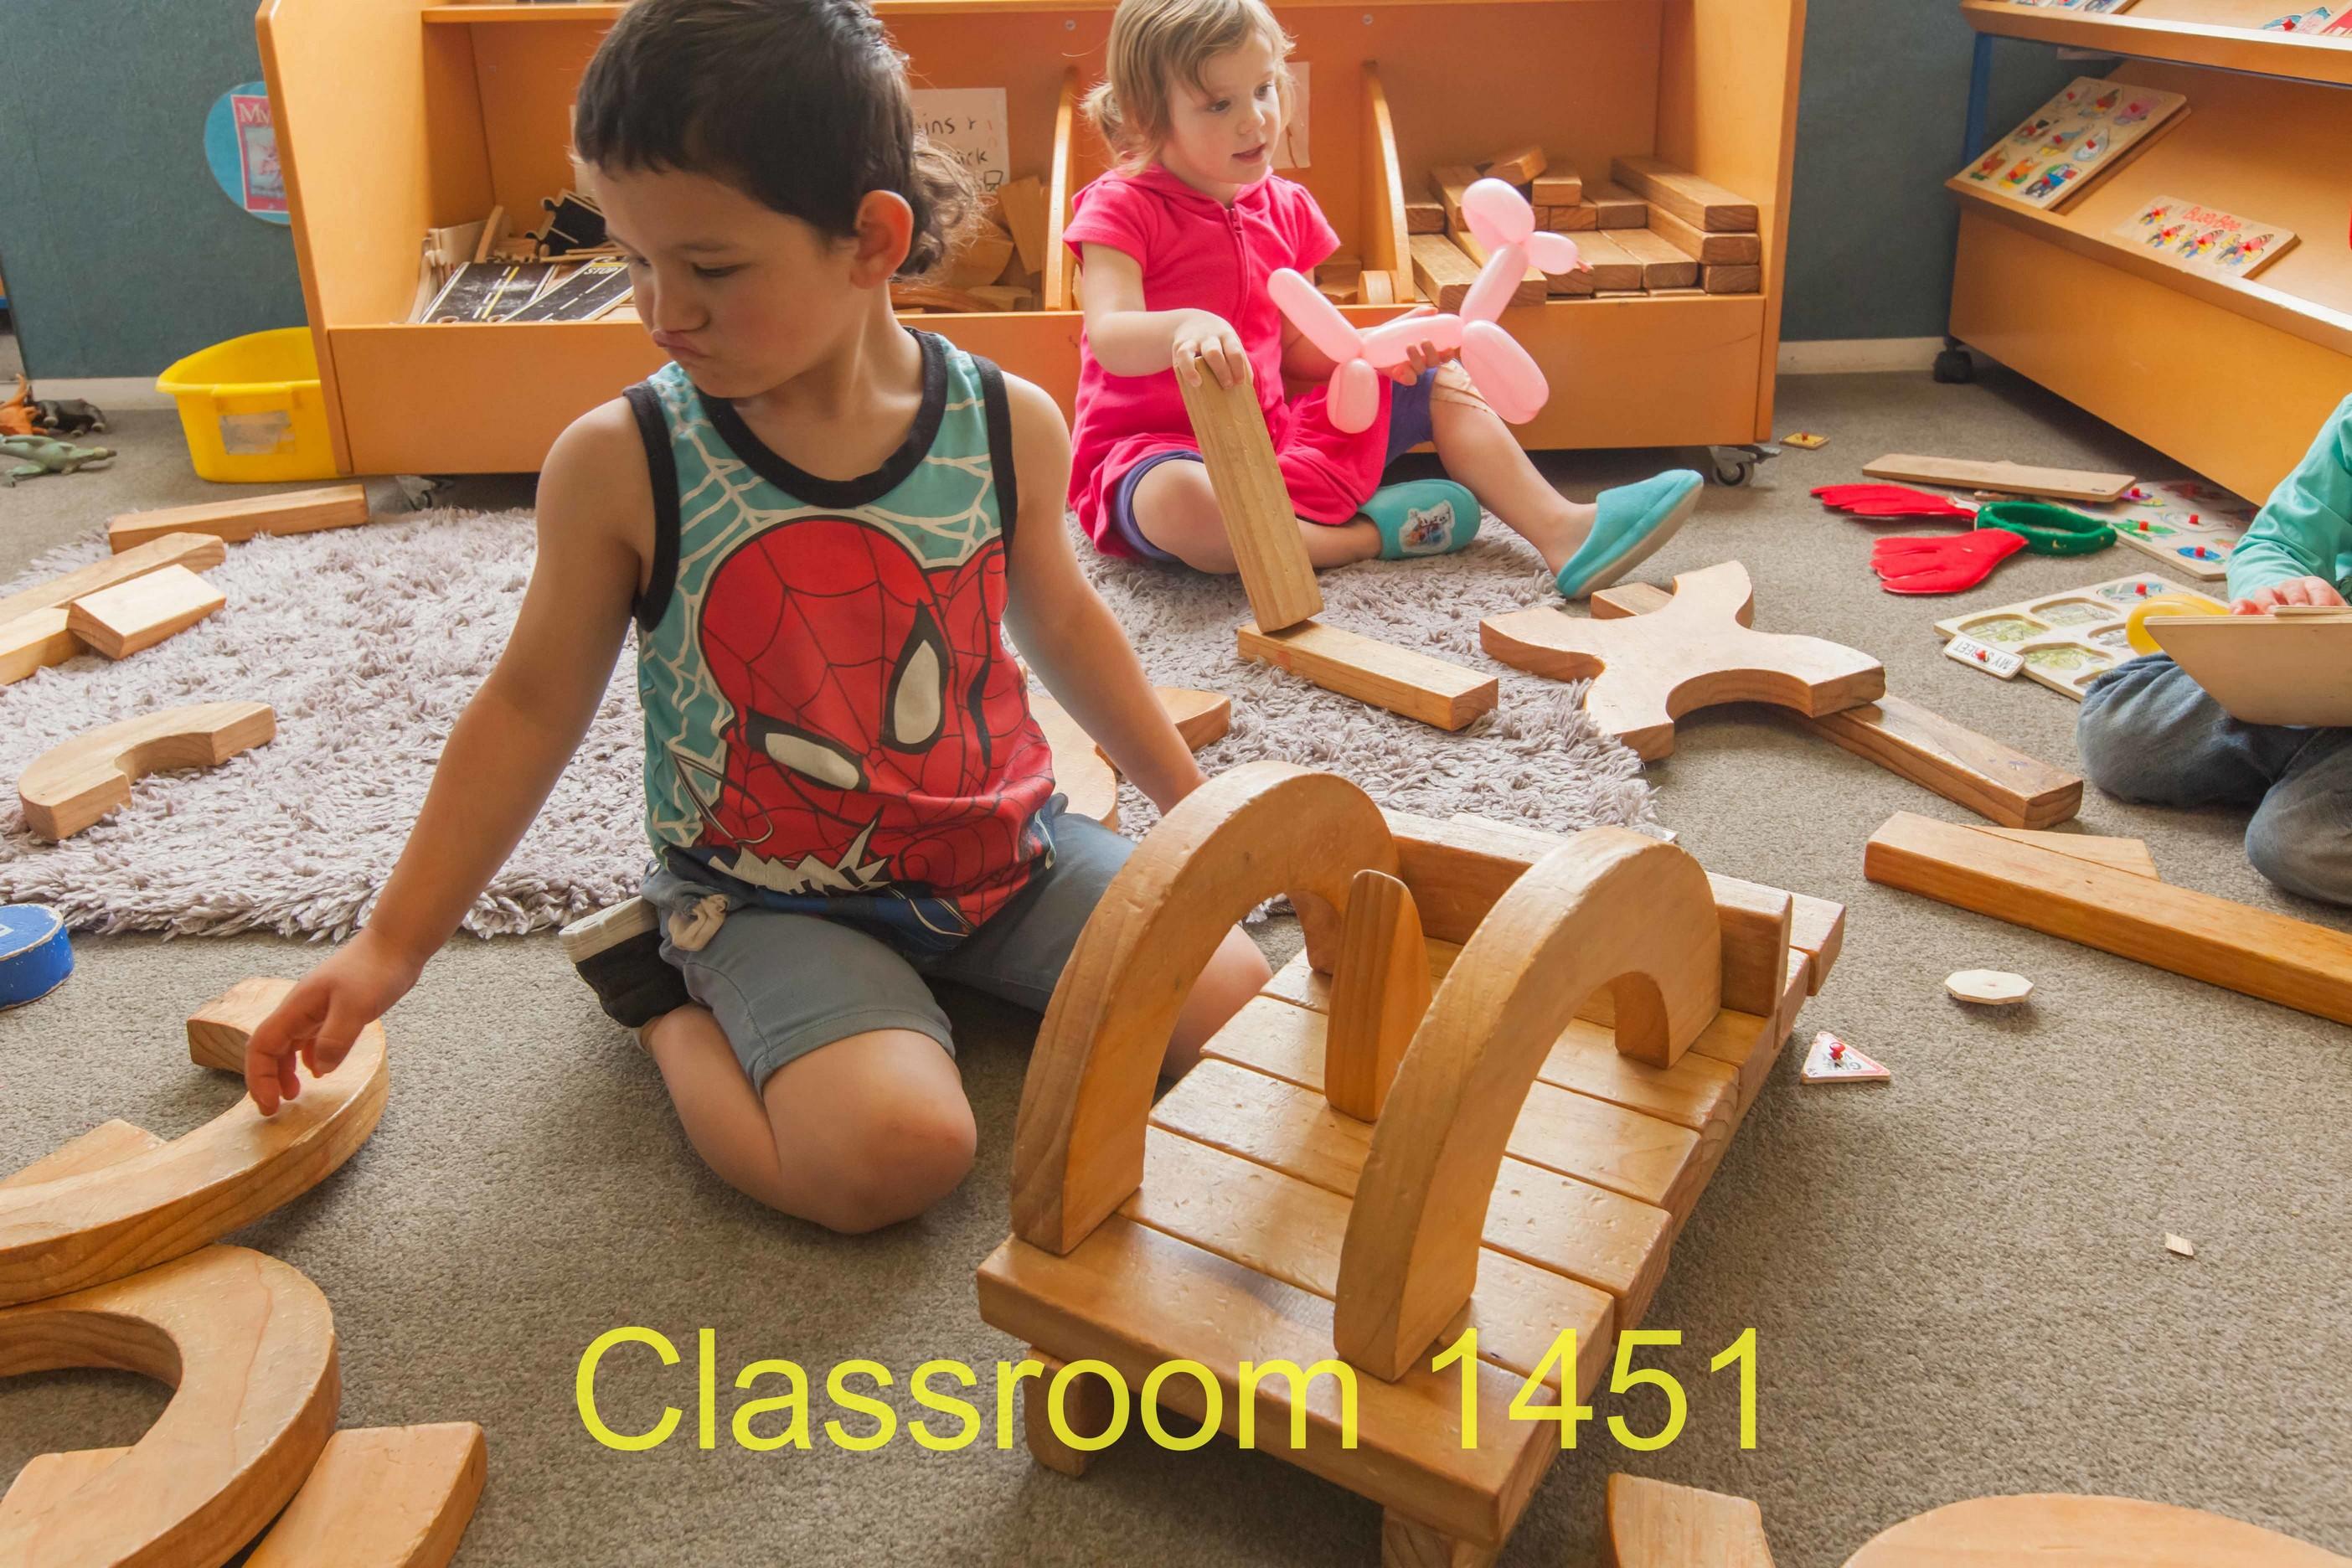 Classroom 1451